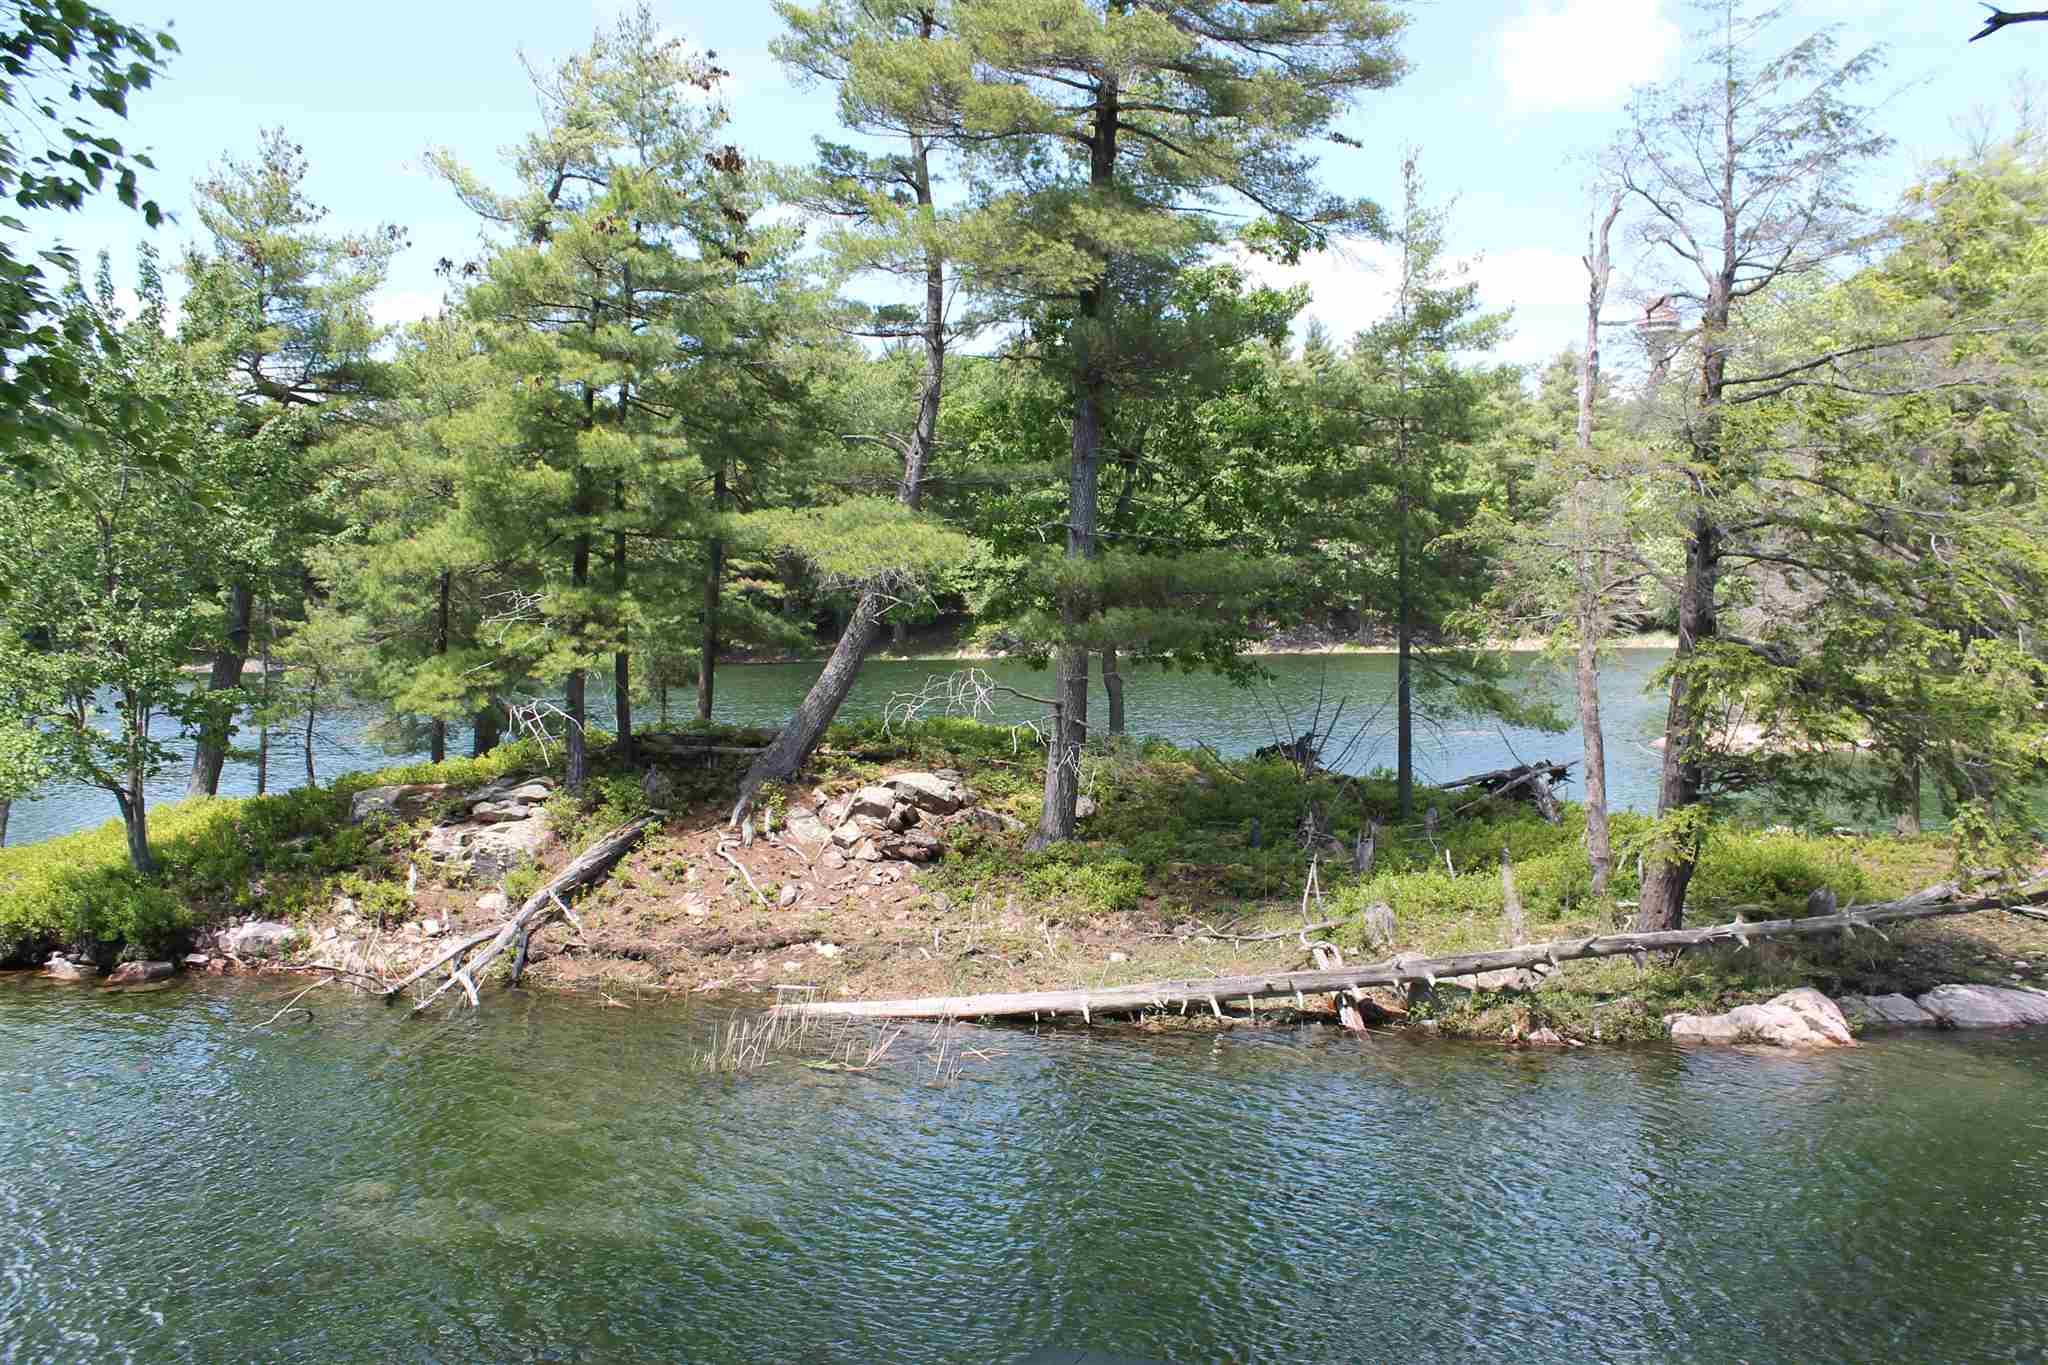 Islands 80 G, 101 I & 101 H, Leeds & 1000 Islands Township, Ontario, Canada